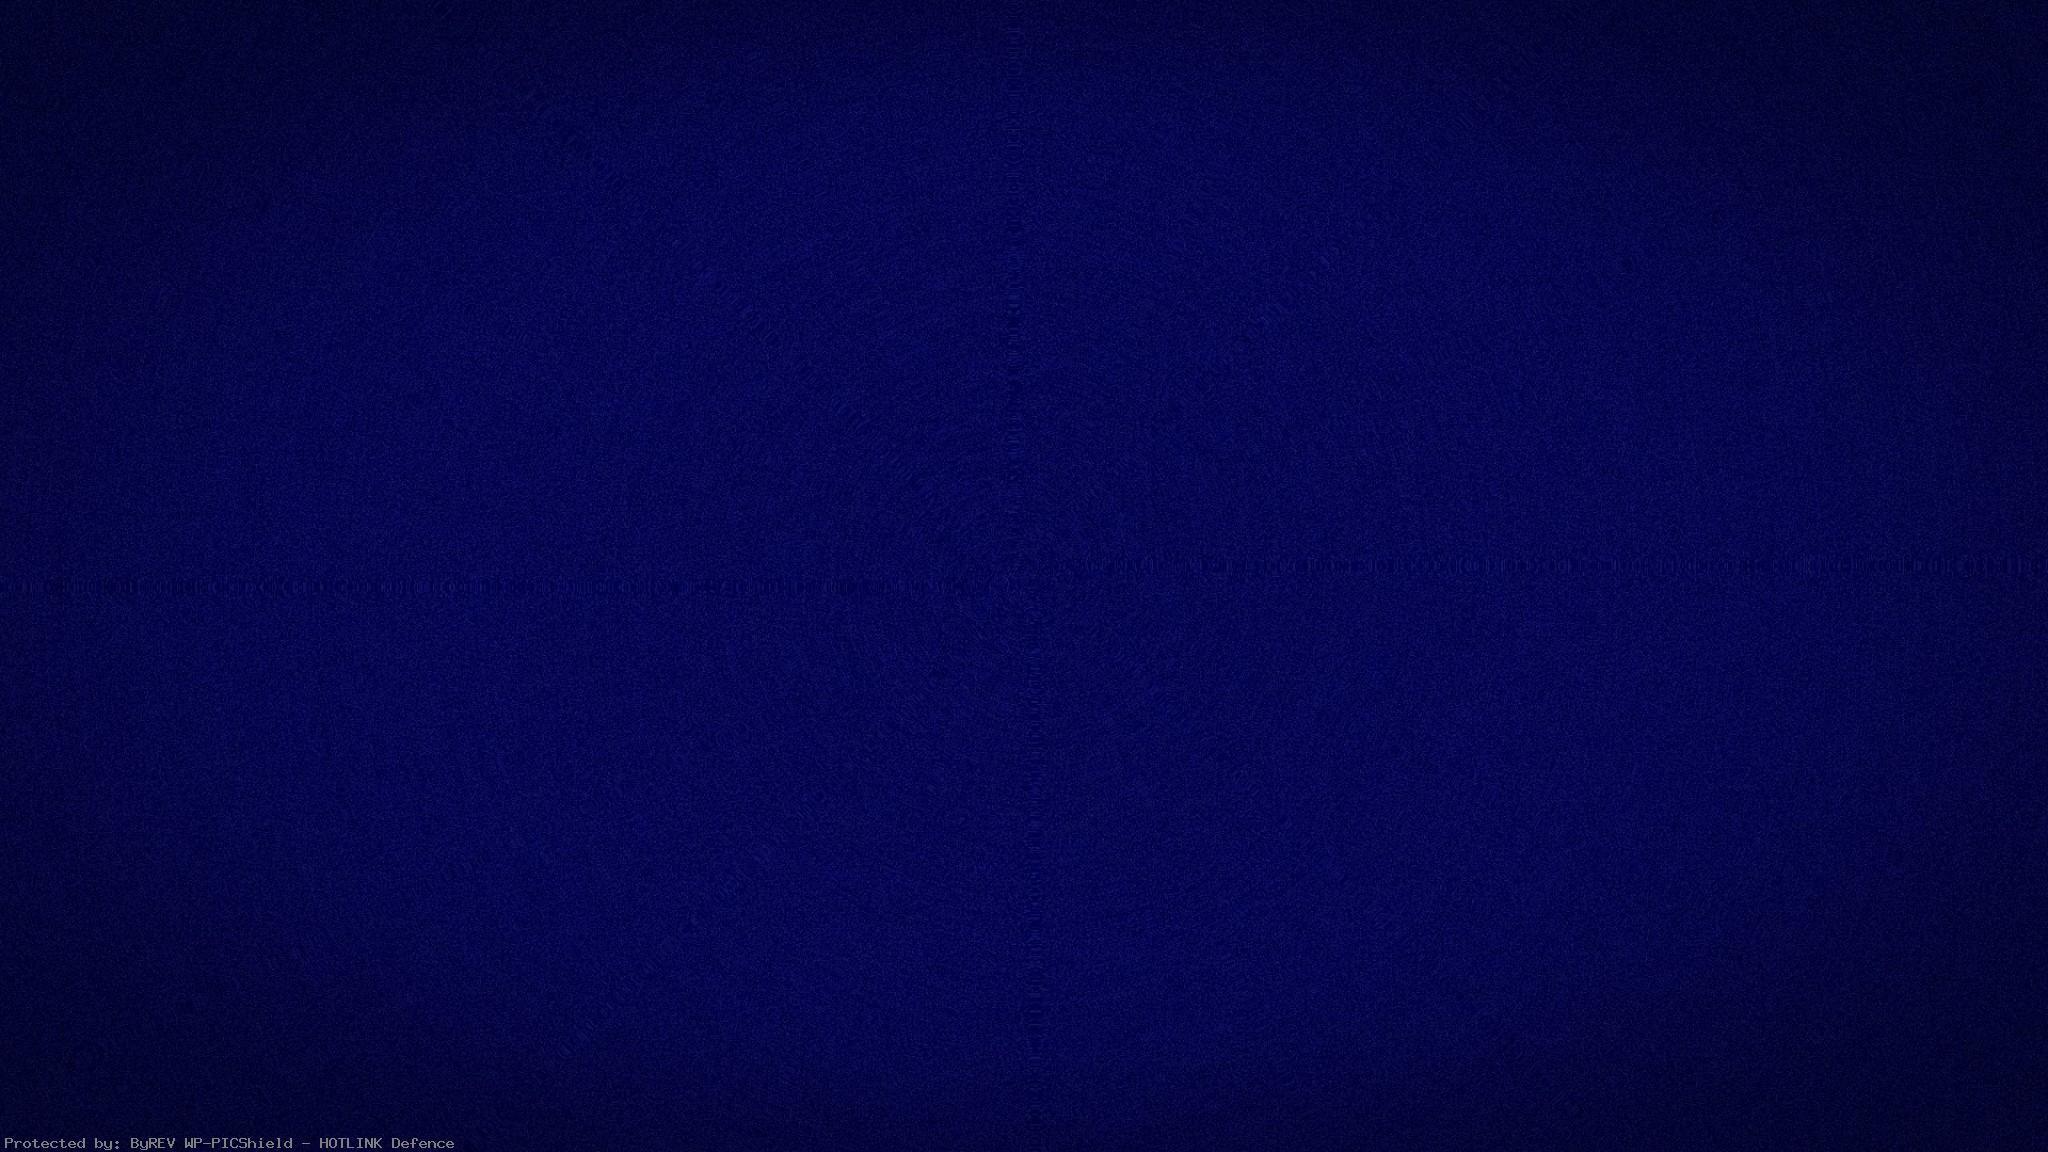 plain blue background wallpaper 183��